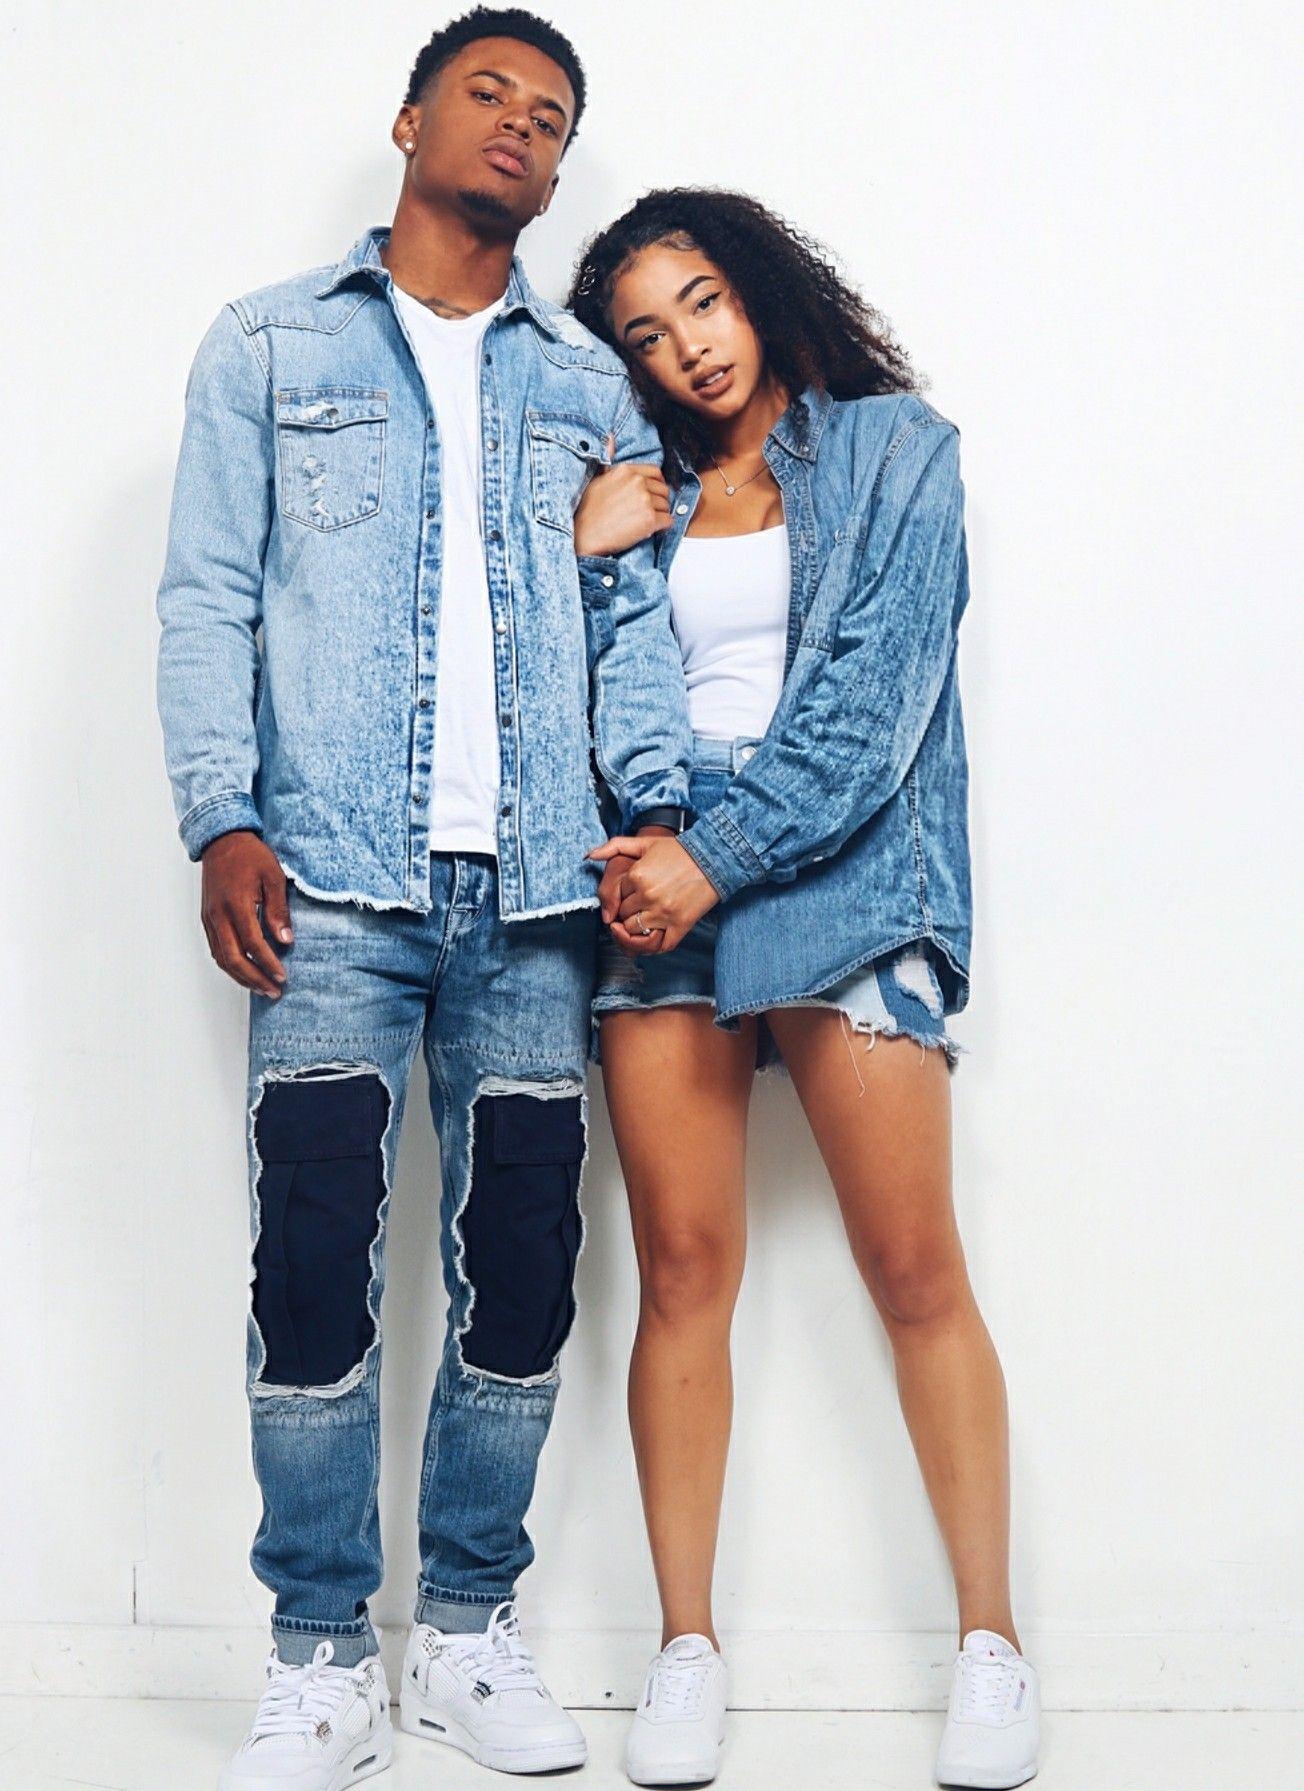 Taraivia Black Couples Goals Black Love Couples Cute Couples Goals